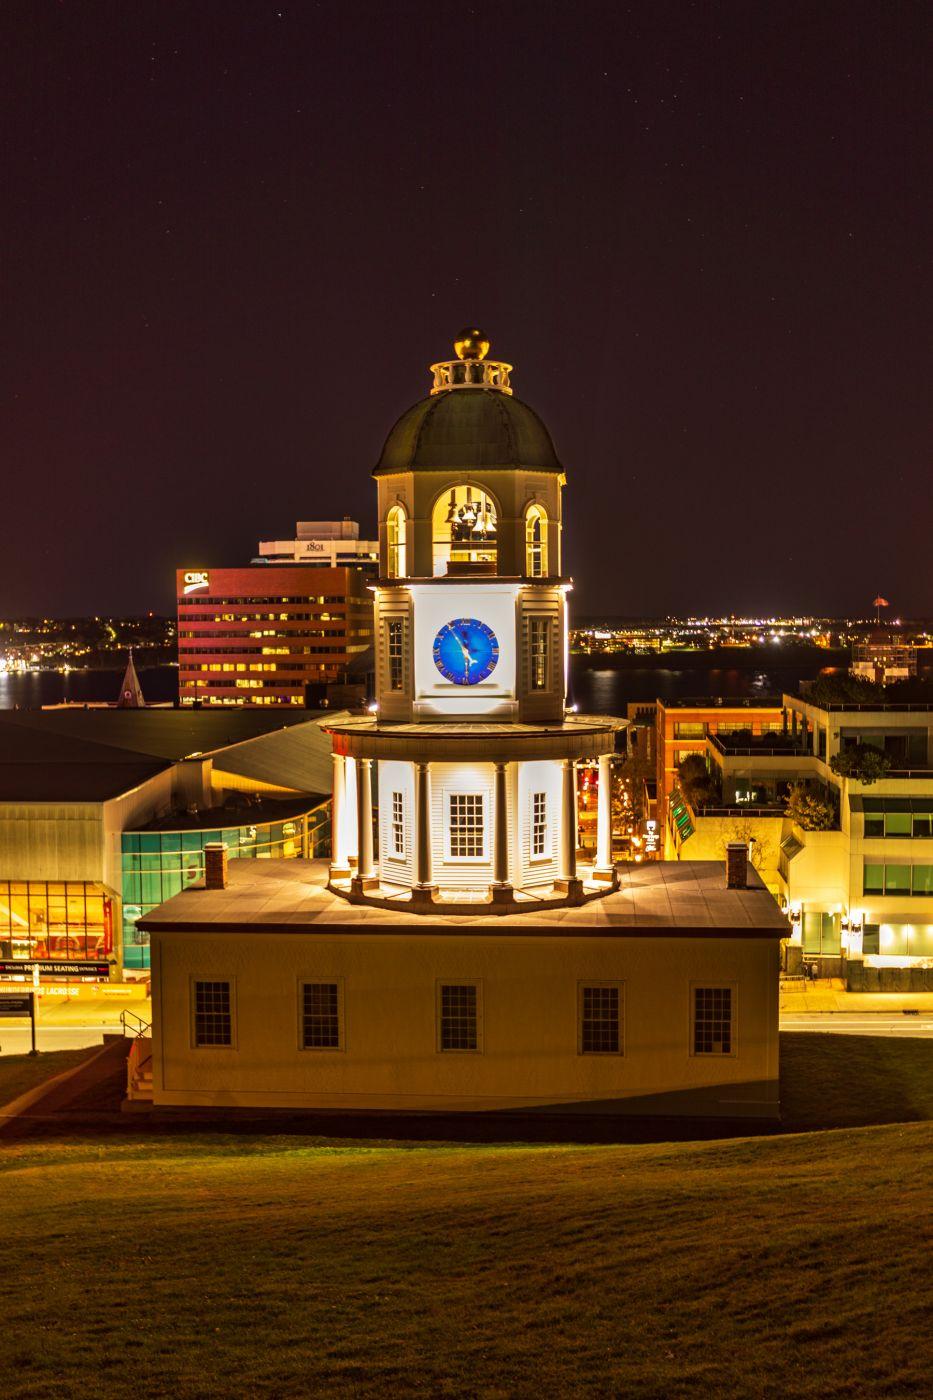 Old Town Clock, Halifax, Nova Scotia, Canada